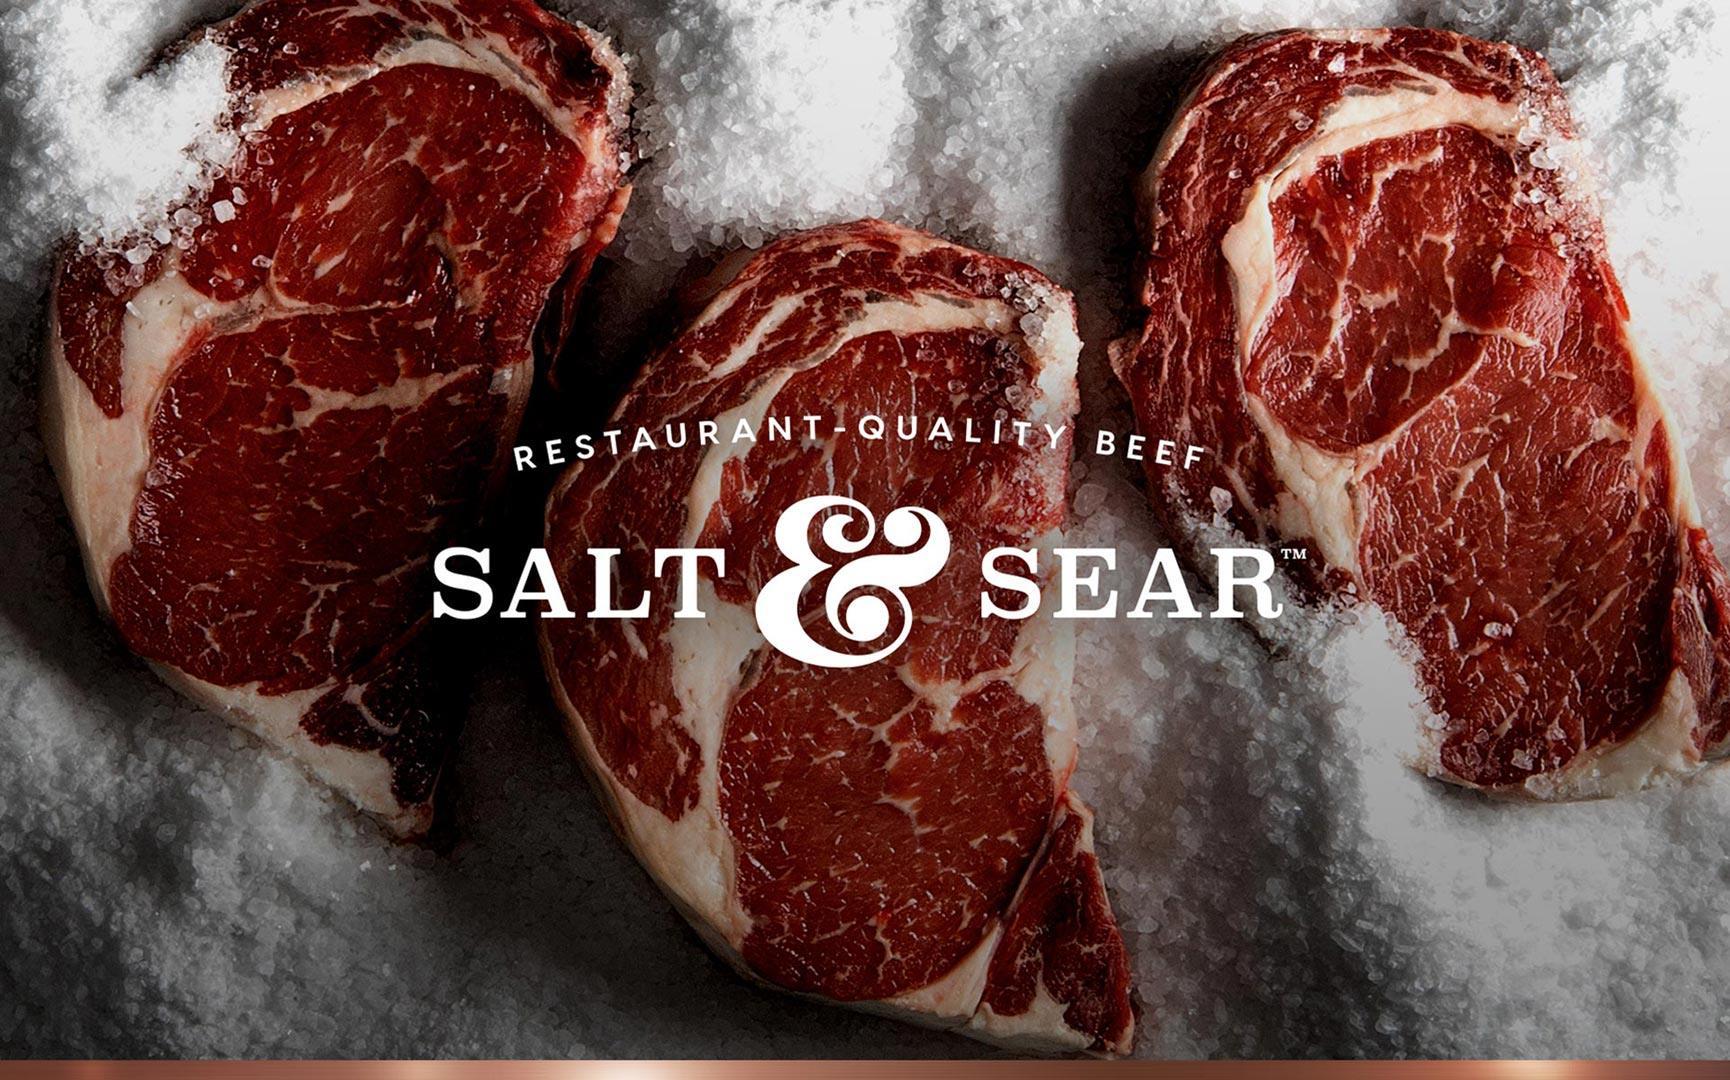 Cargill: Salt & Sear Restaurant-Quality Beef